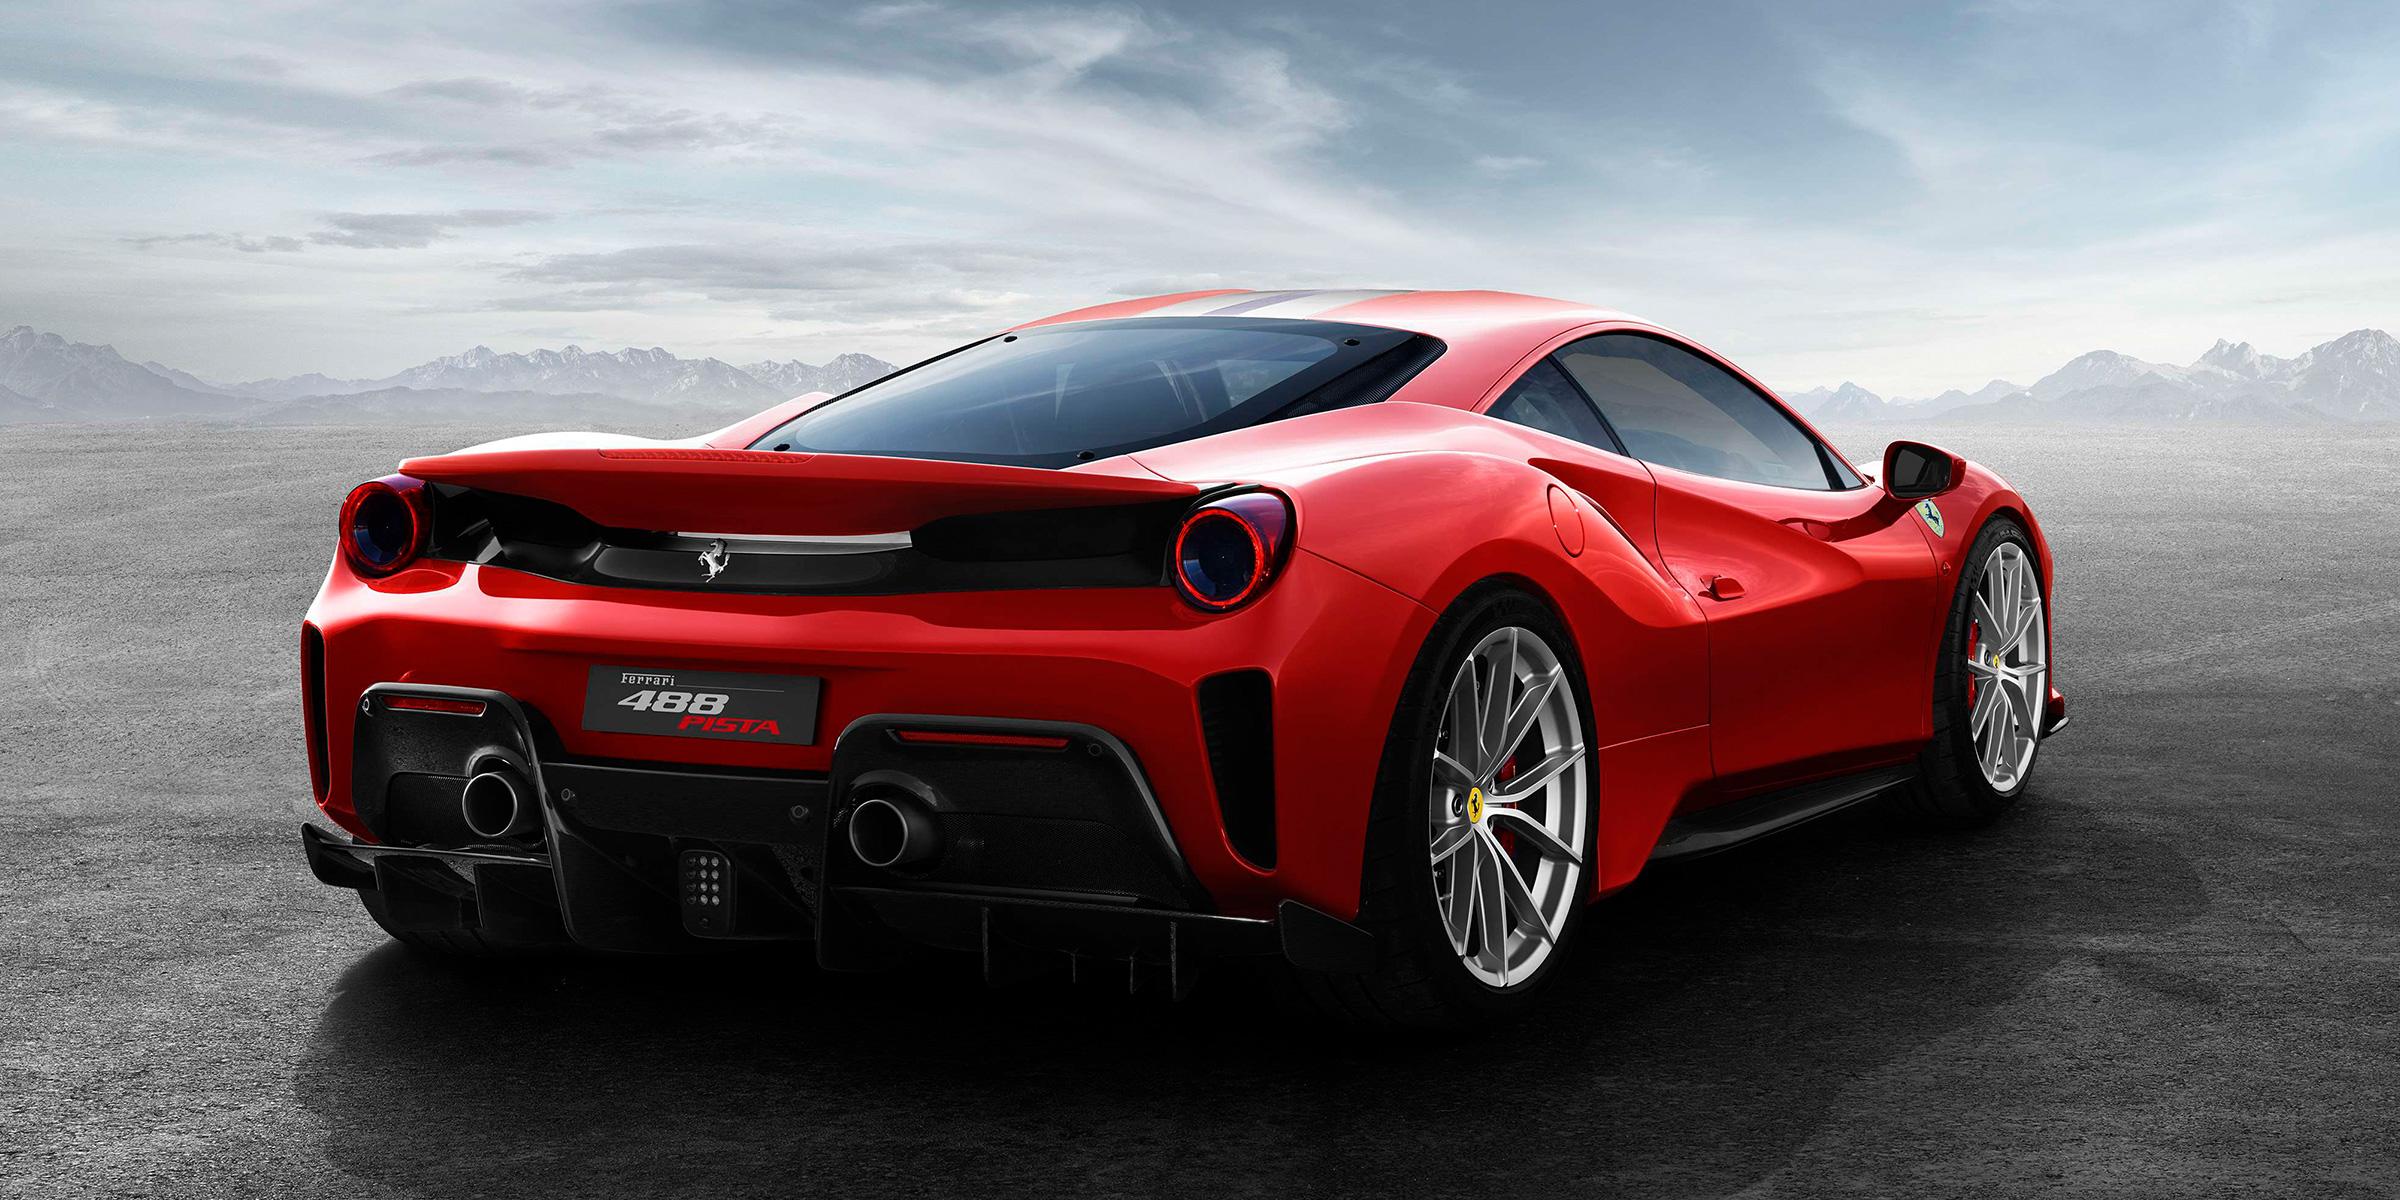 2018 Ferrari Special Edition 488 Pista